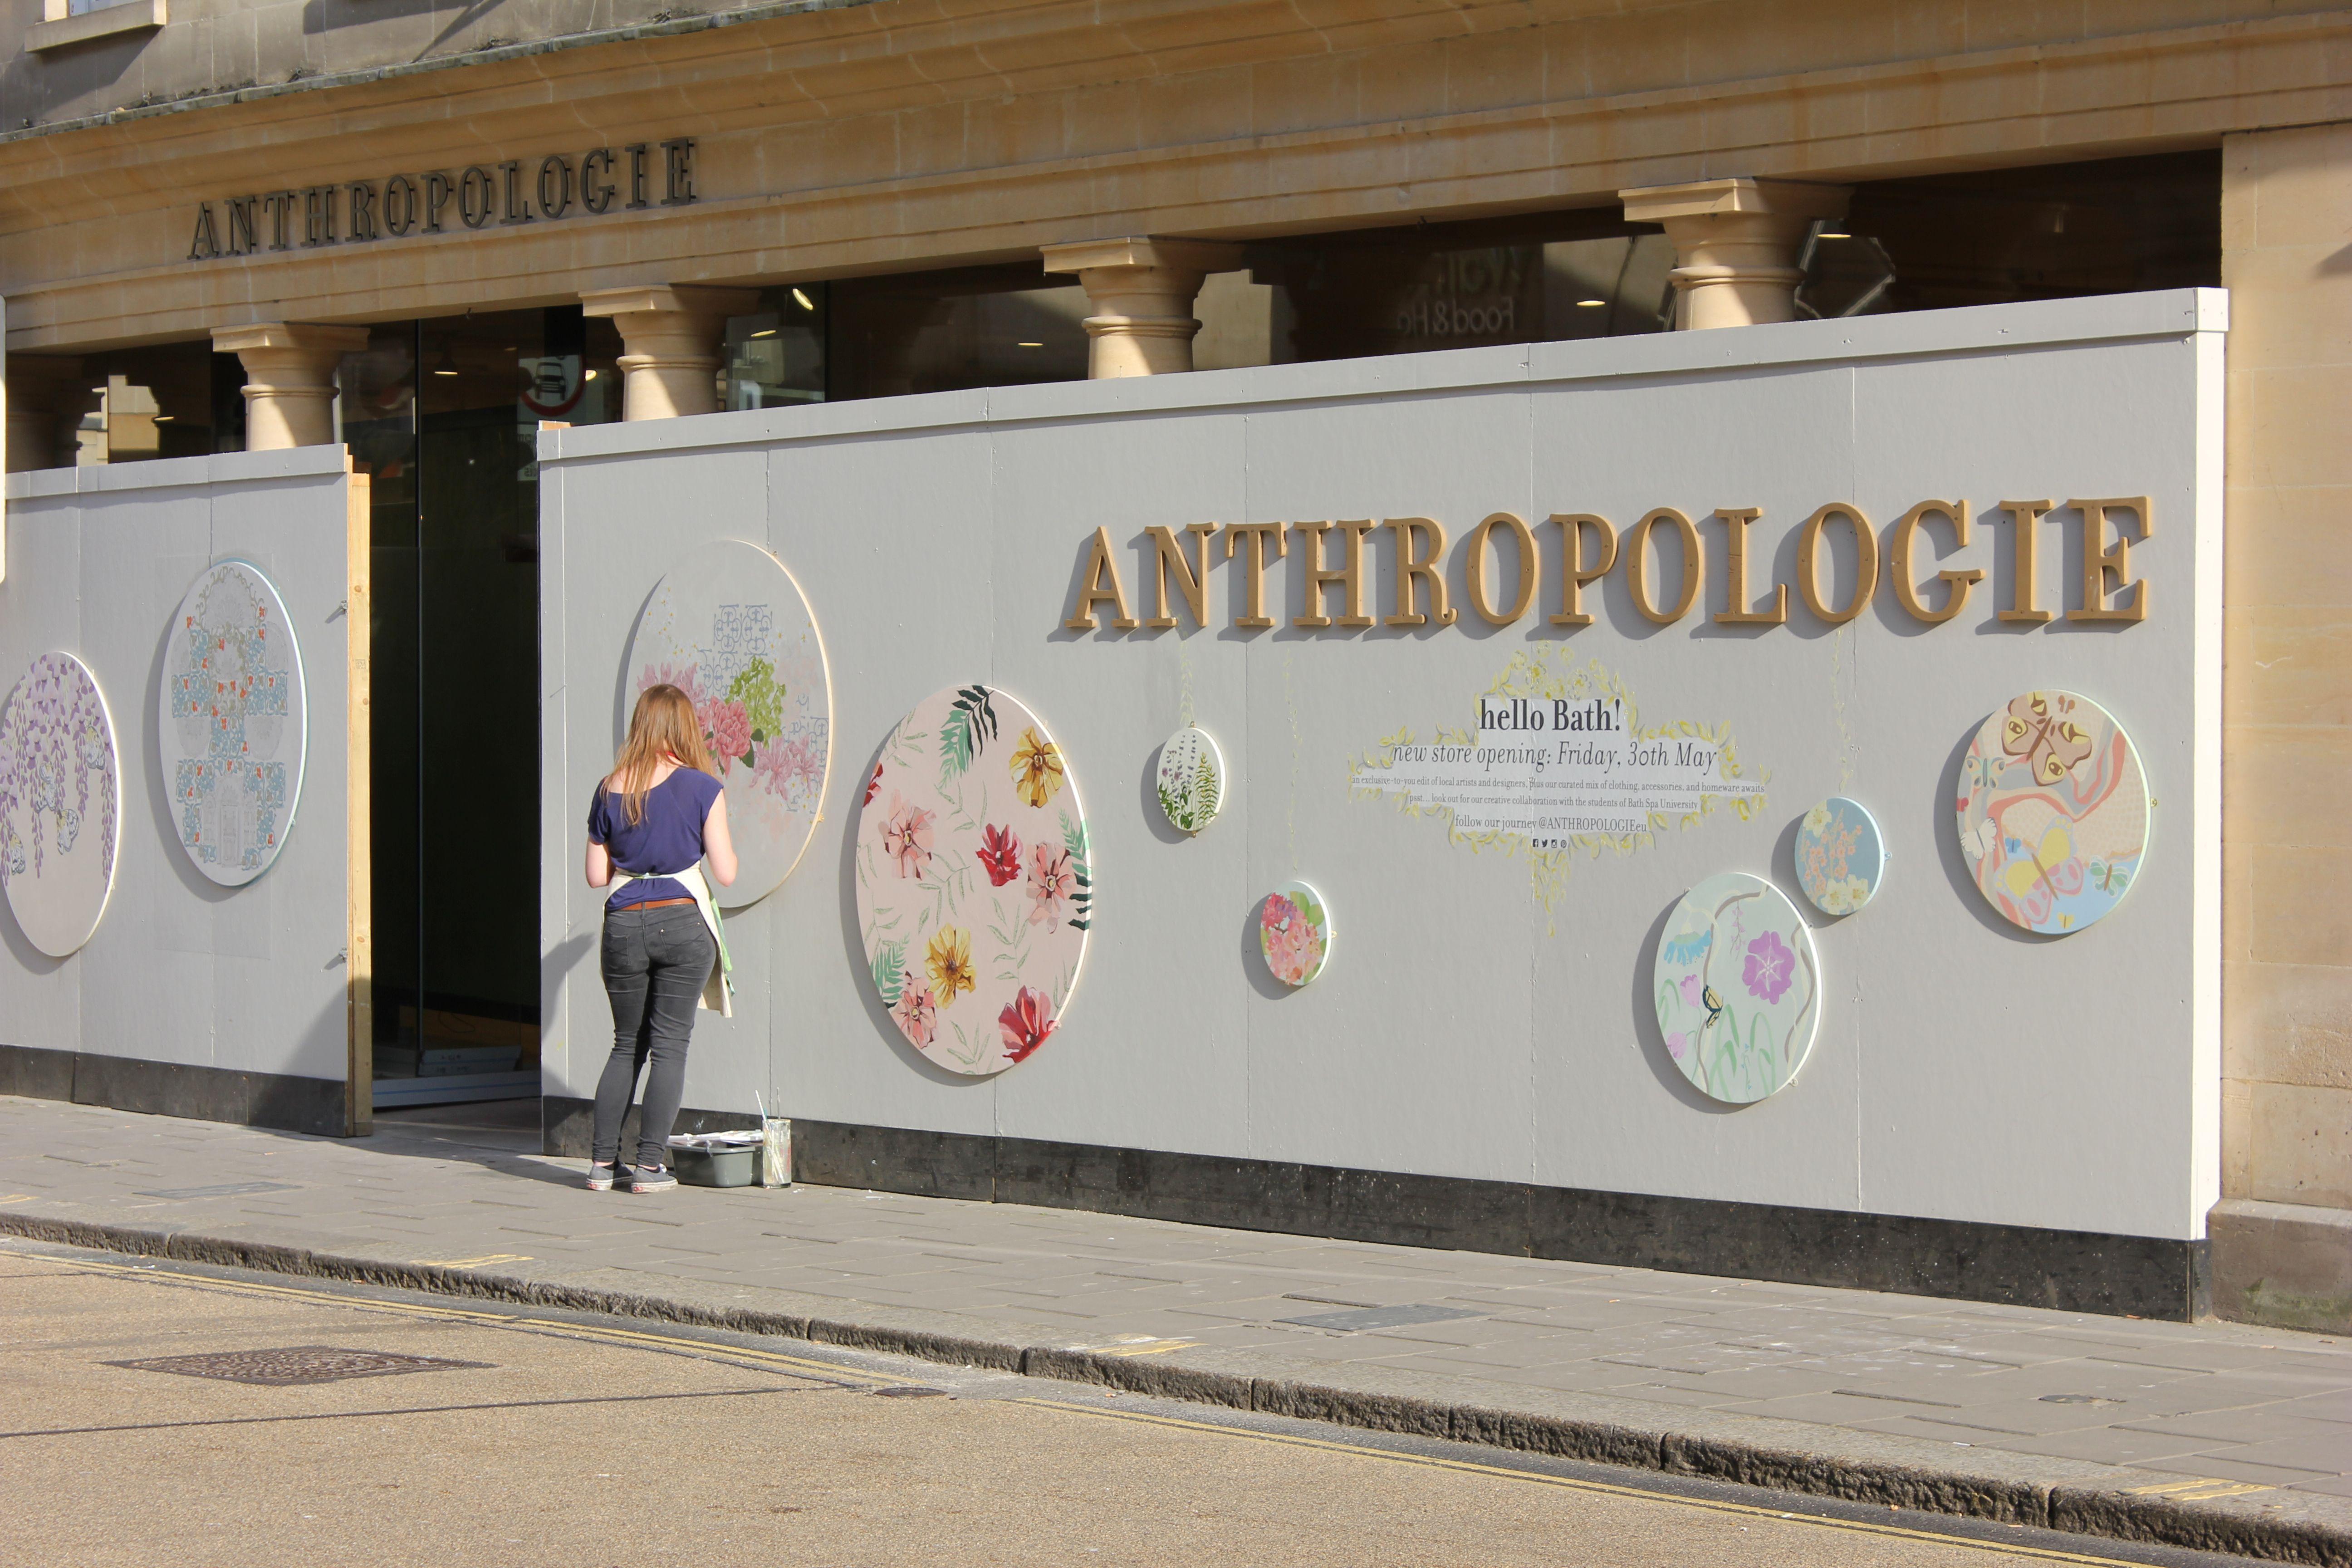 New anthropologie store opening in bath hoarding designed